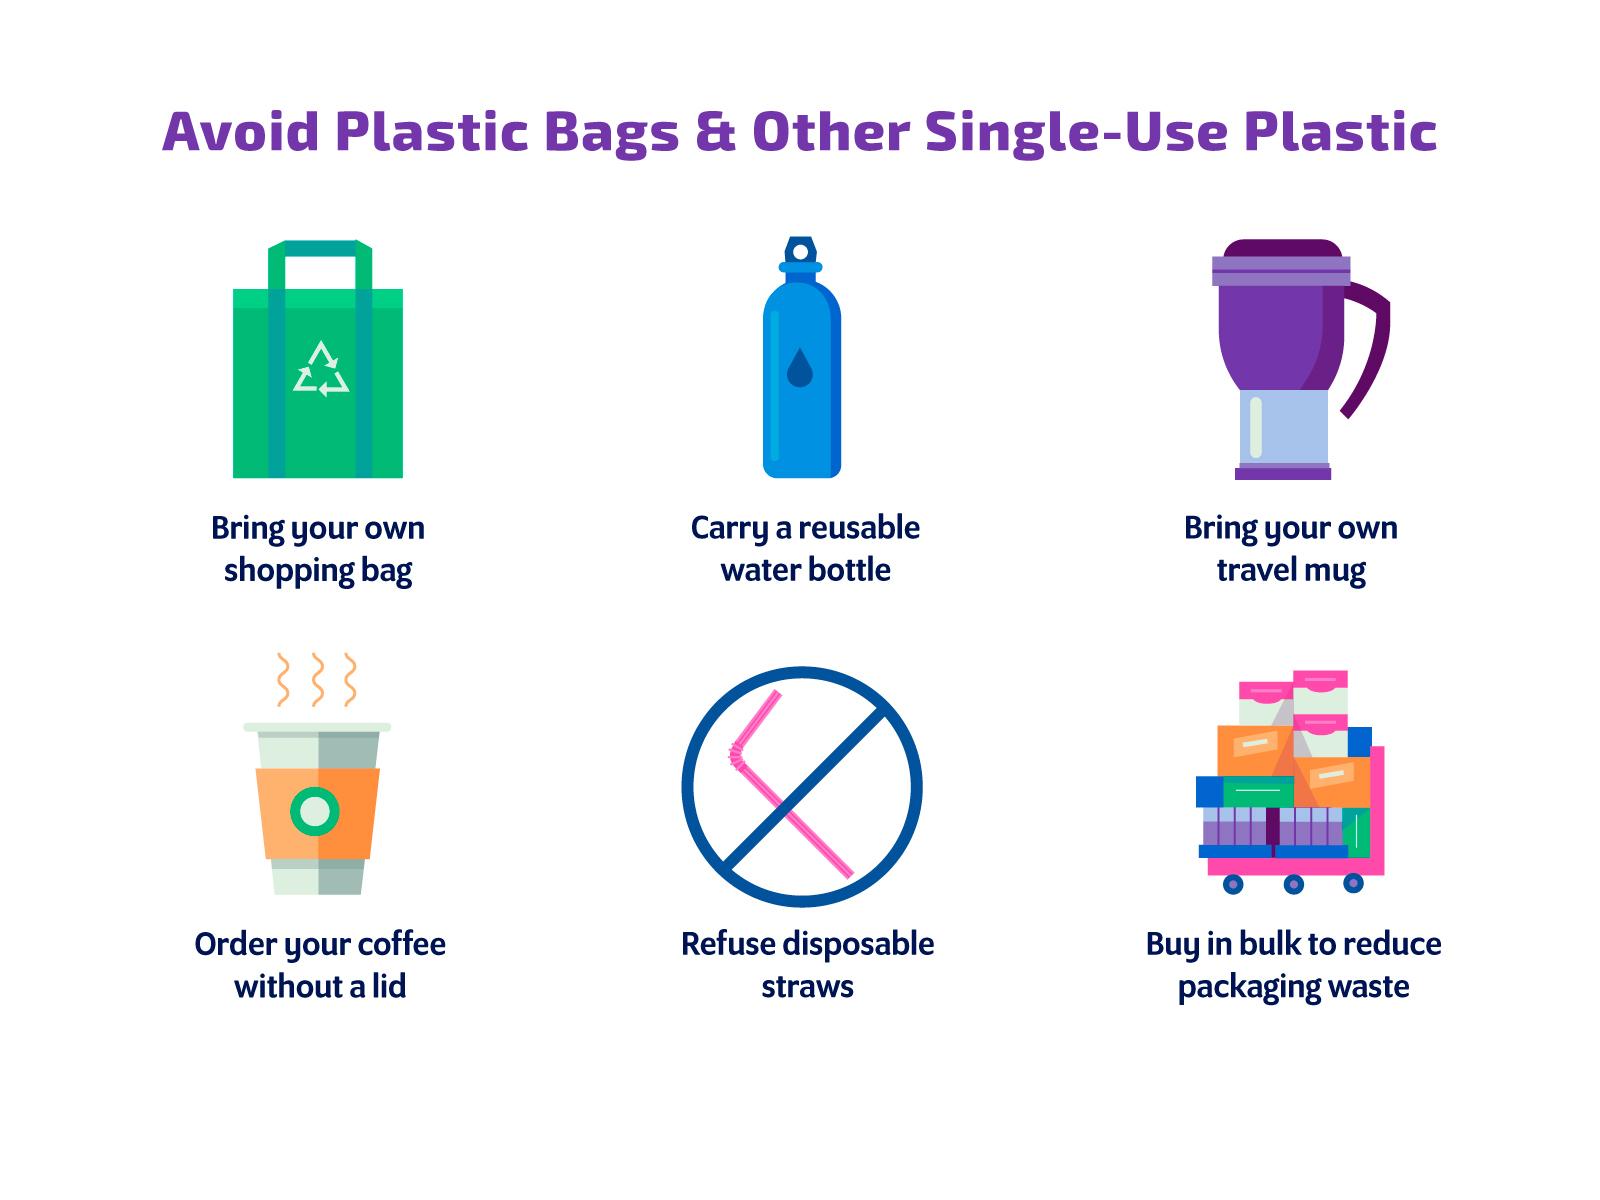 avoid plast bados blog - HD1600×1200